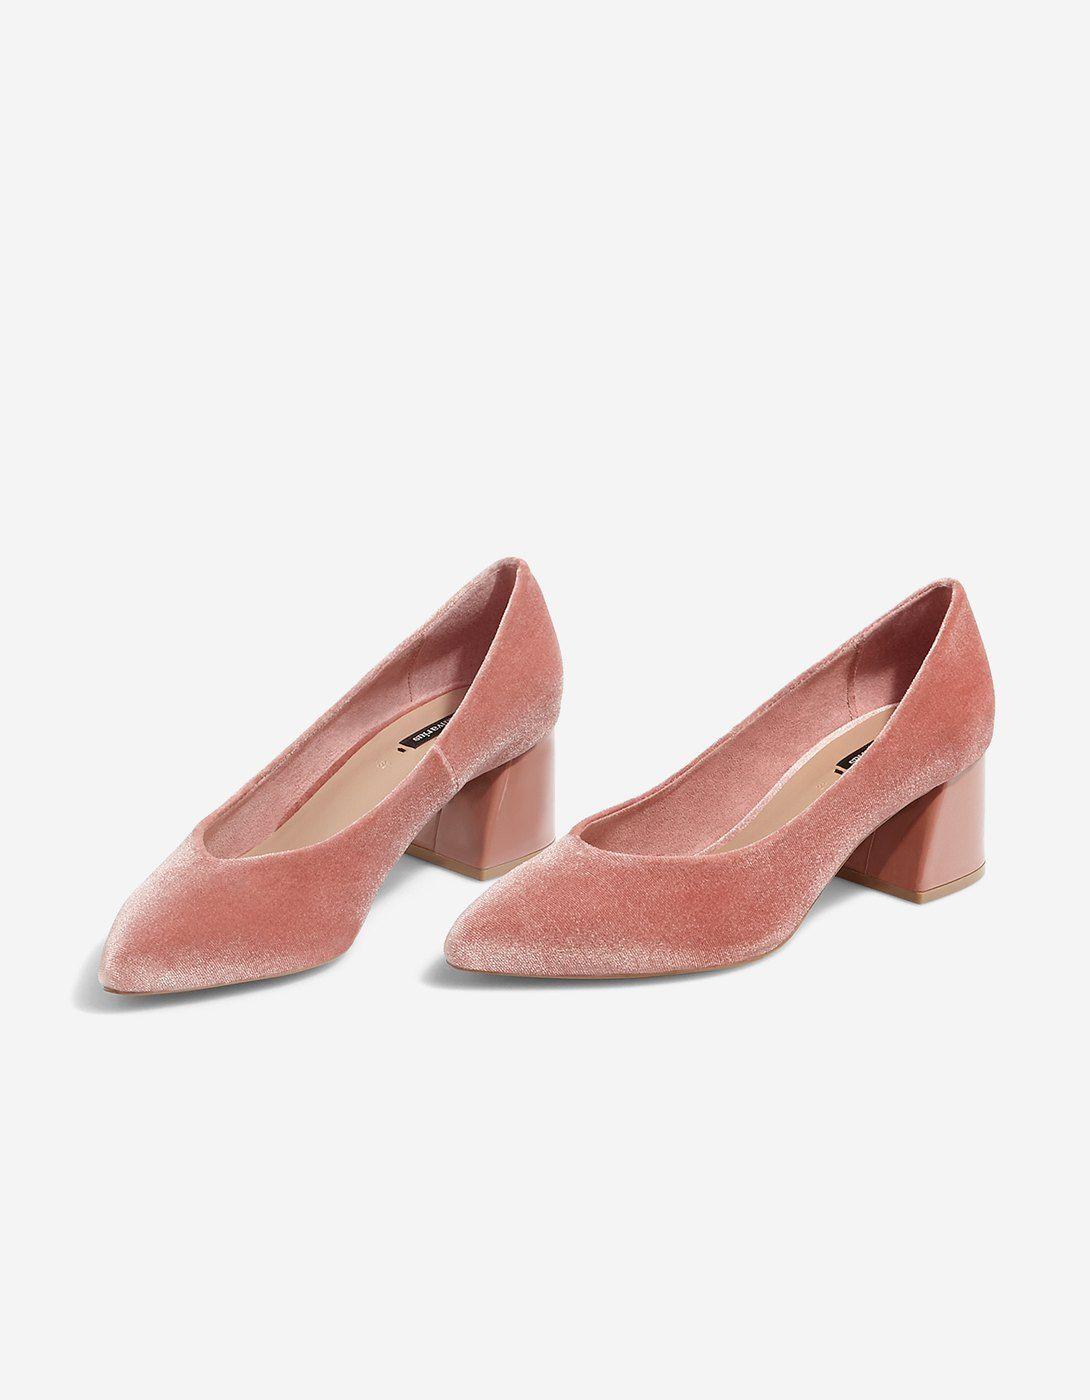 7fdc36b1dac Velvet mid heel shoes - All